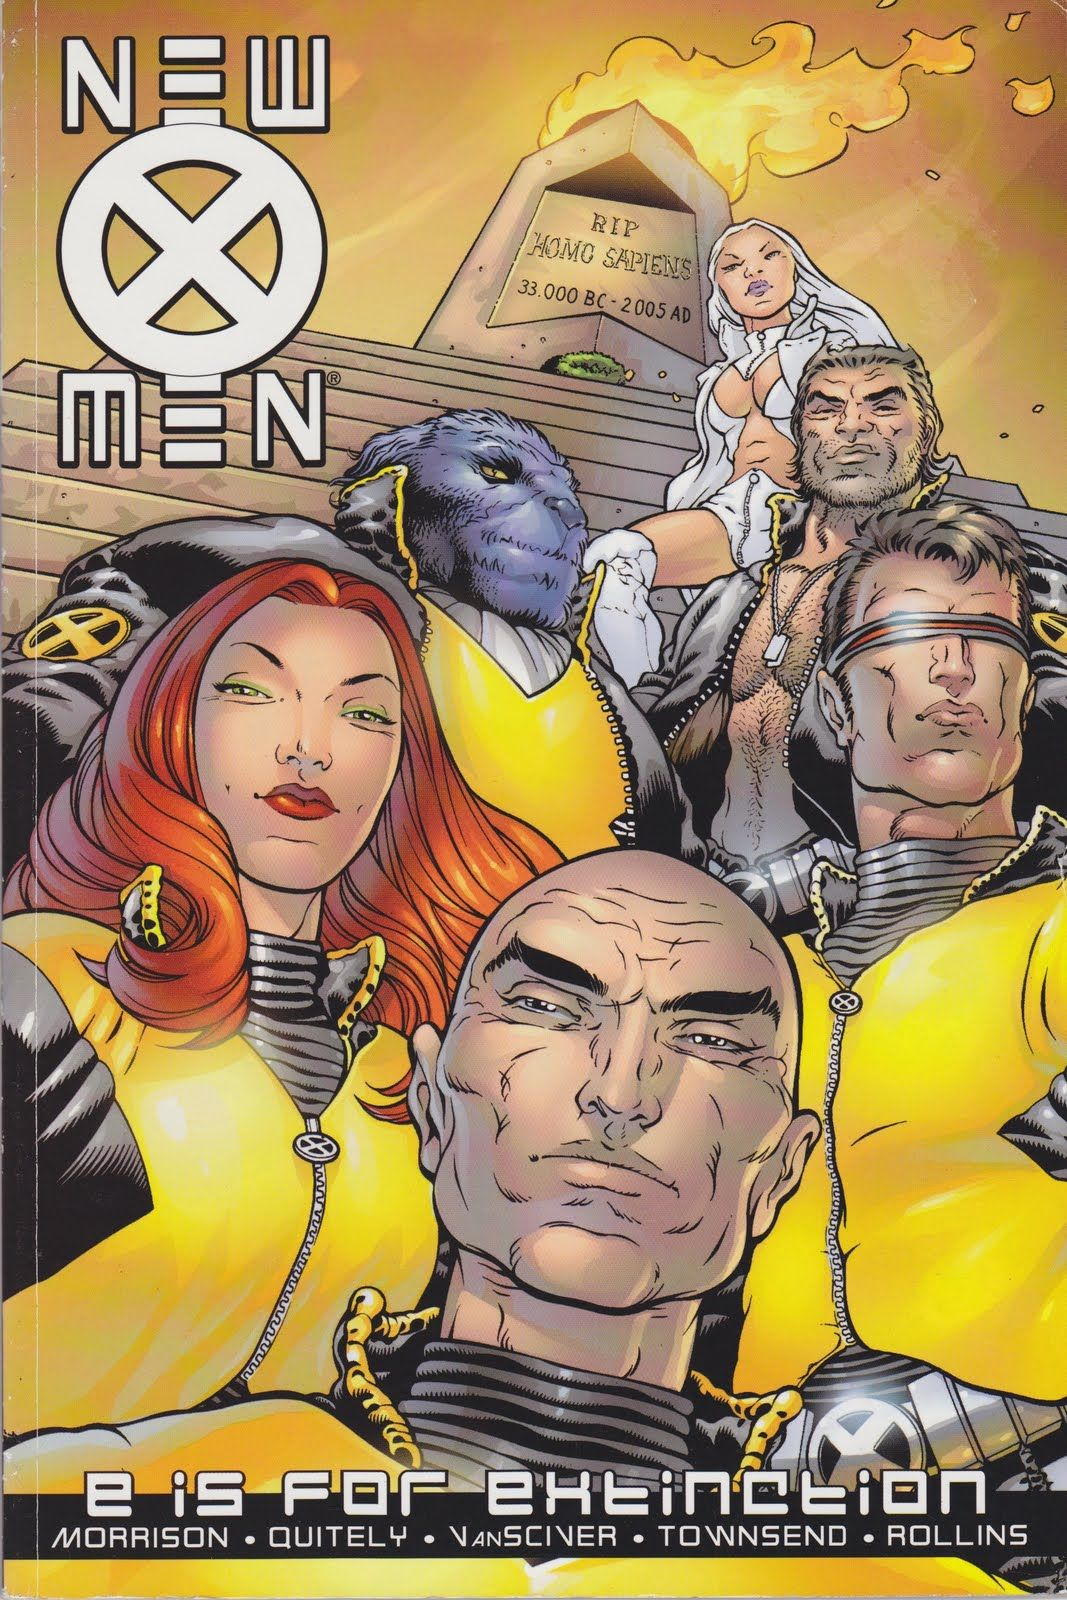 Comic New Xmen By Grant Morrison Favorite Characters Emma Frost Phoenix Xorn The Healer Beast Aka Henry Mccoy The Stepford C Grant Morrison X Men Comics